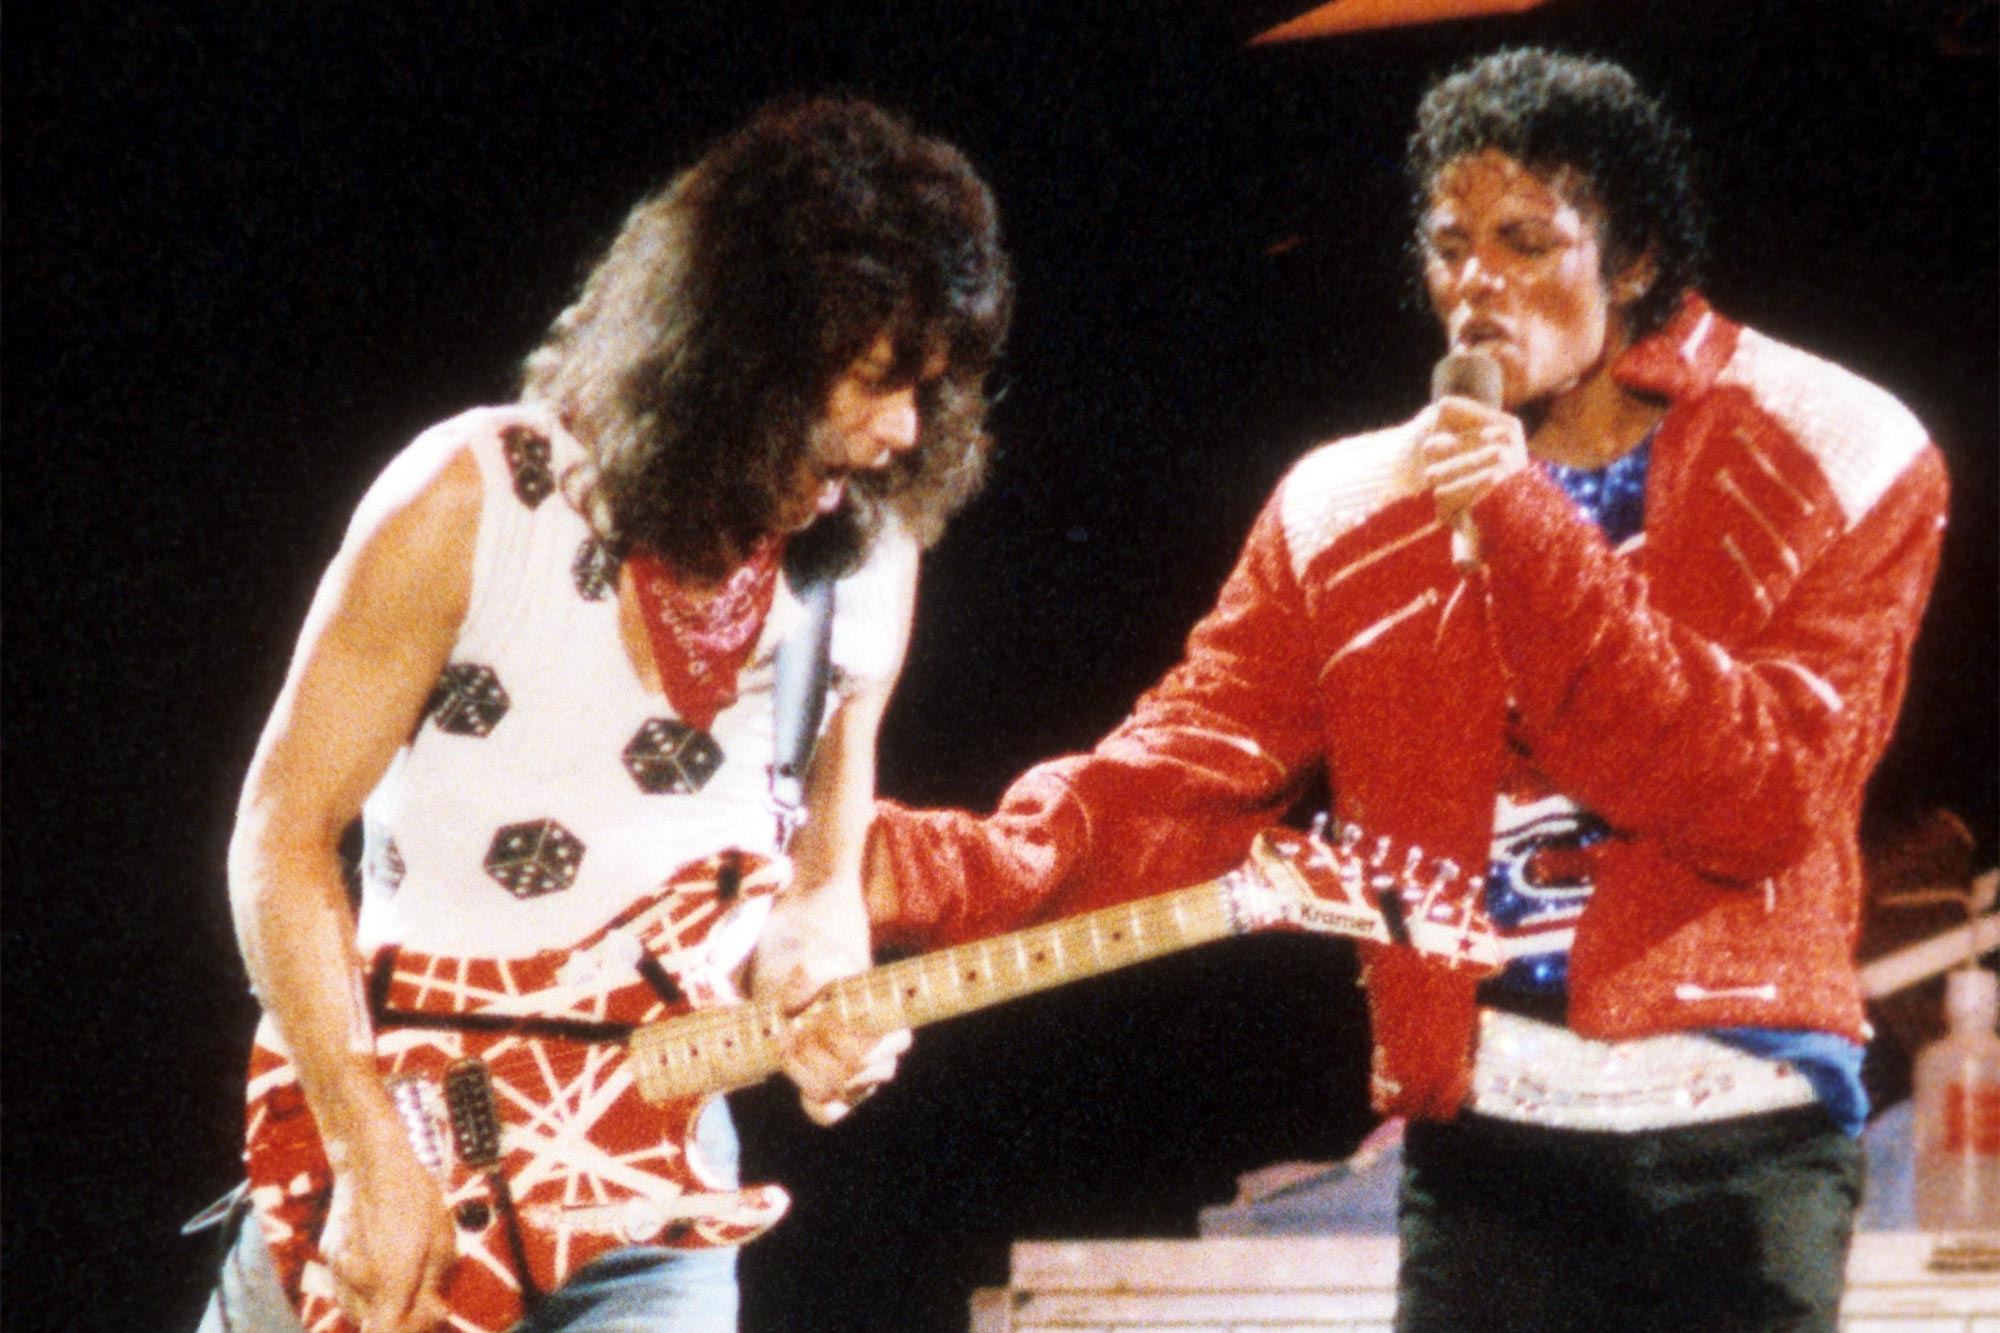 Eddie Van Halen, Michael Jackson